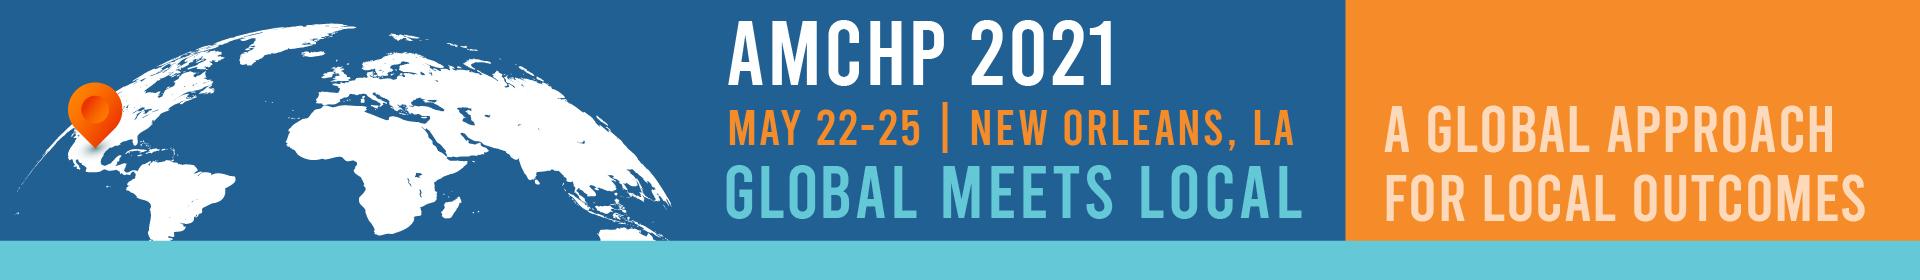 AMCHP 2021 Event Banner